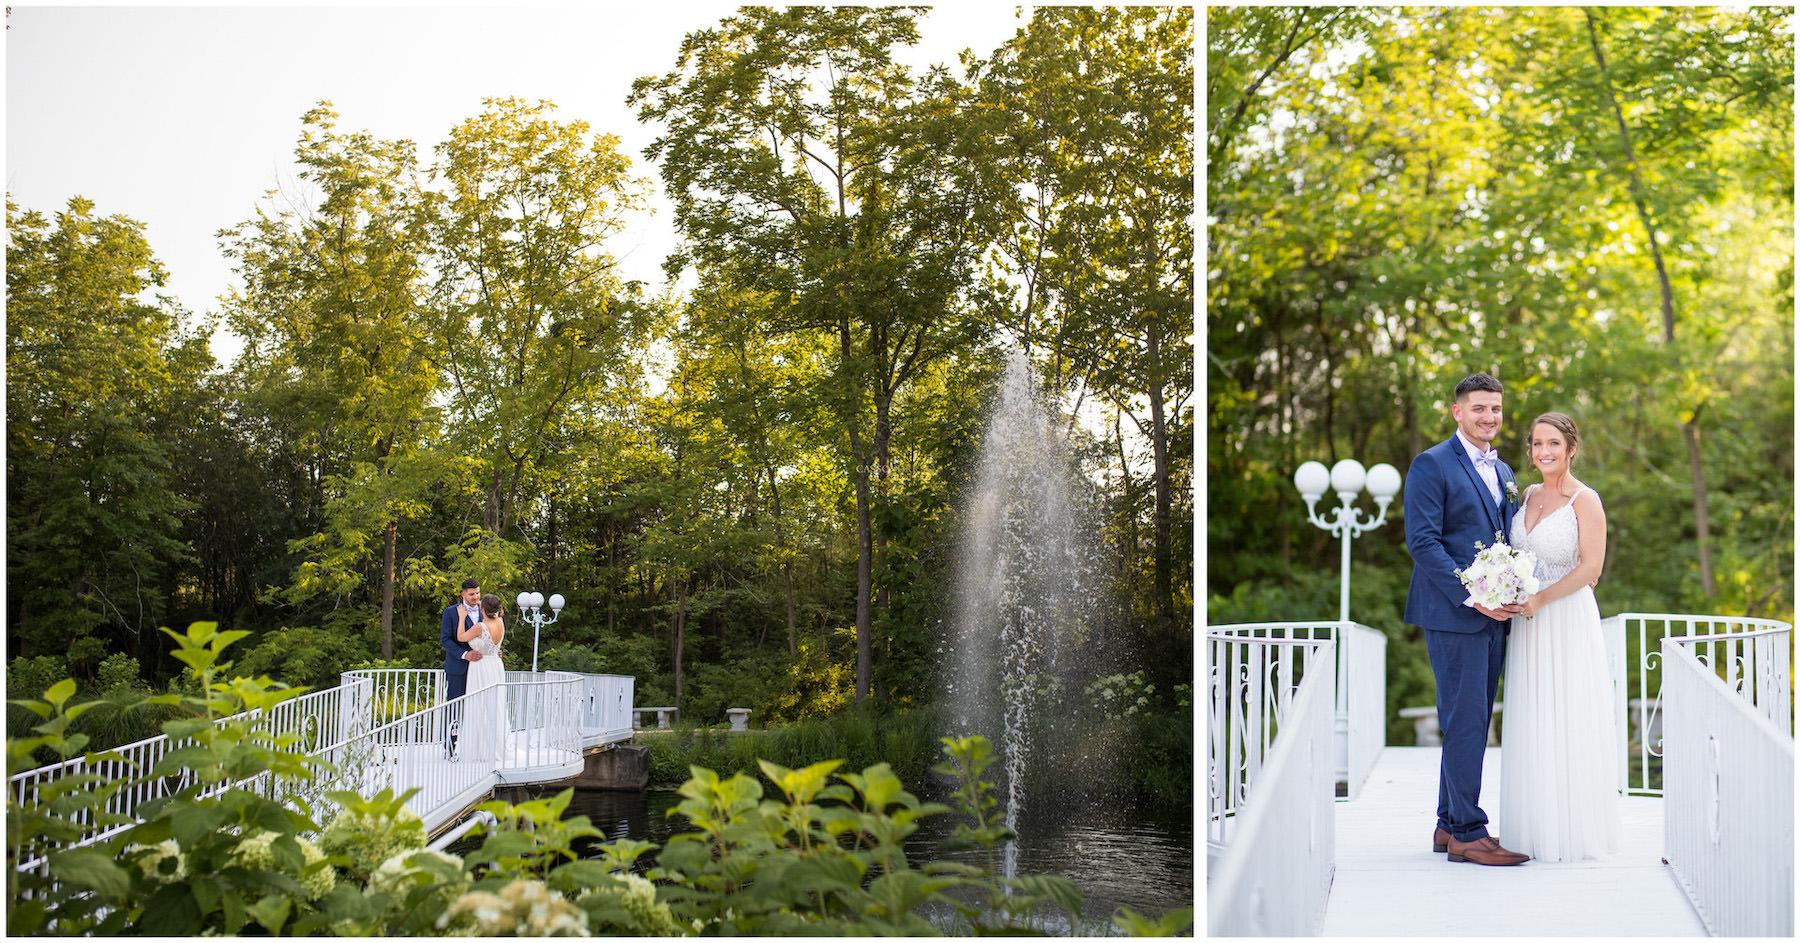 Cassondre Mae Photography Villa Venezia Wedding Photographer 29.jpg